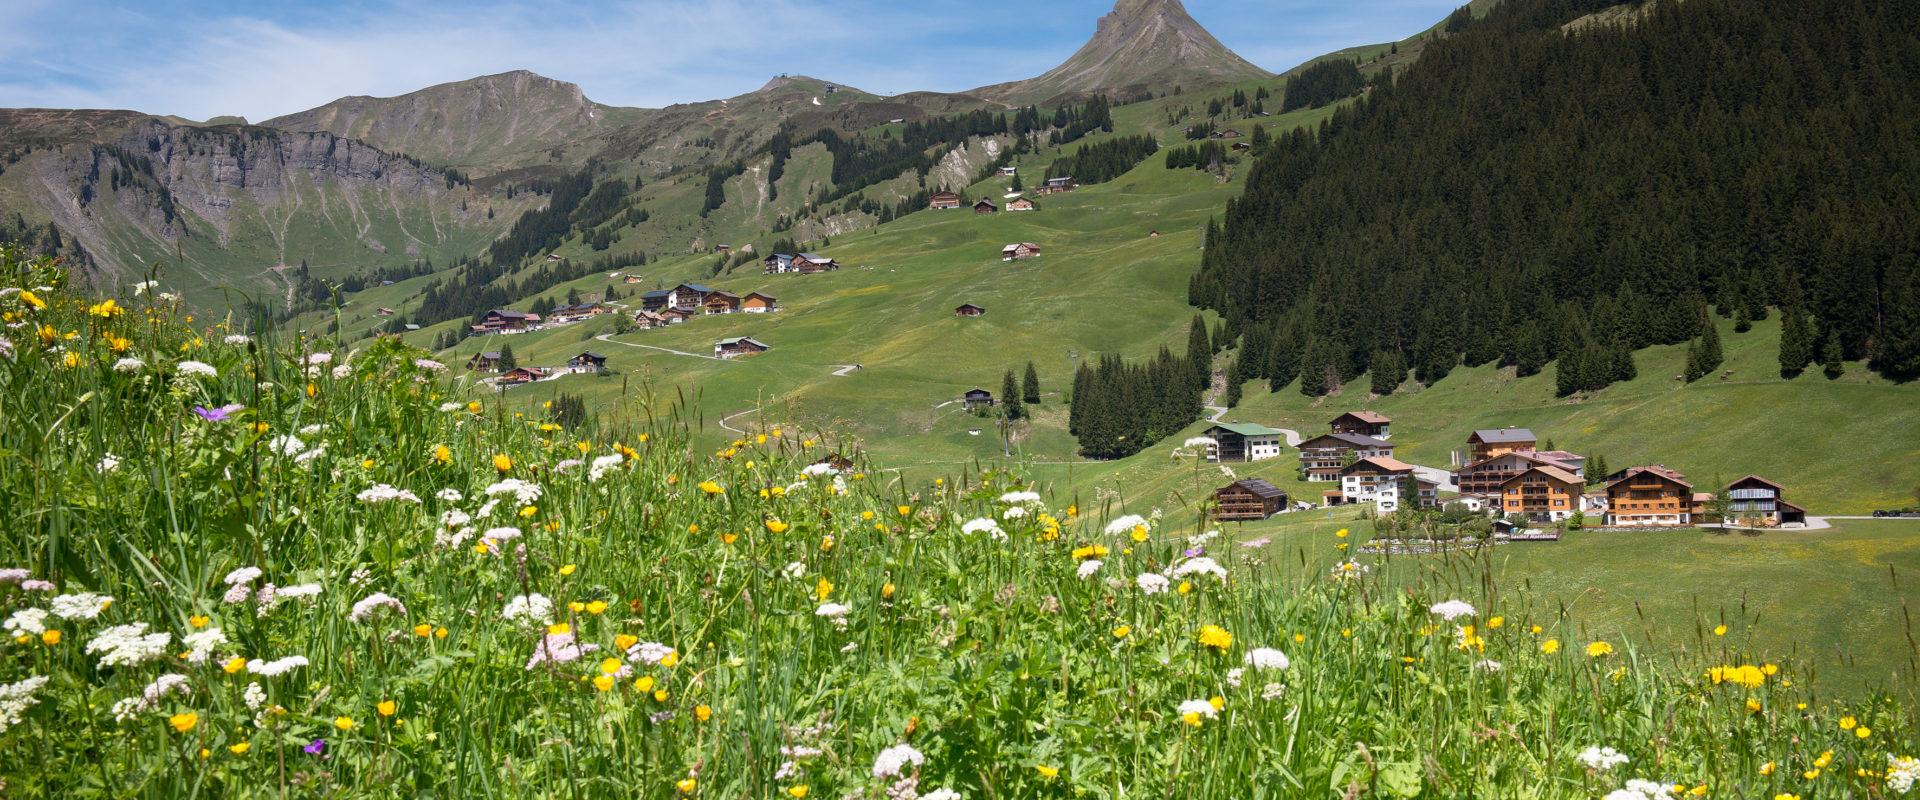 Landschaft Damüls © Huber Images - Damüls-Faschina Tourismus